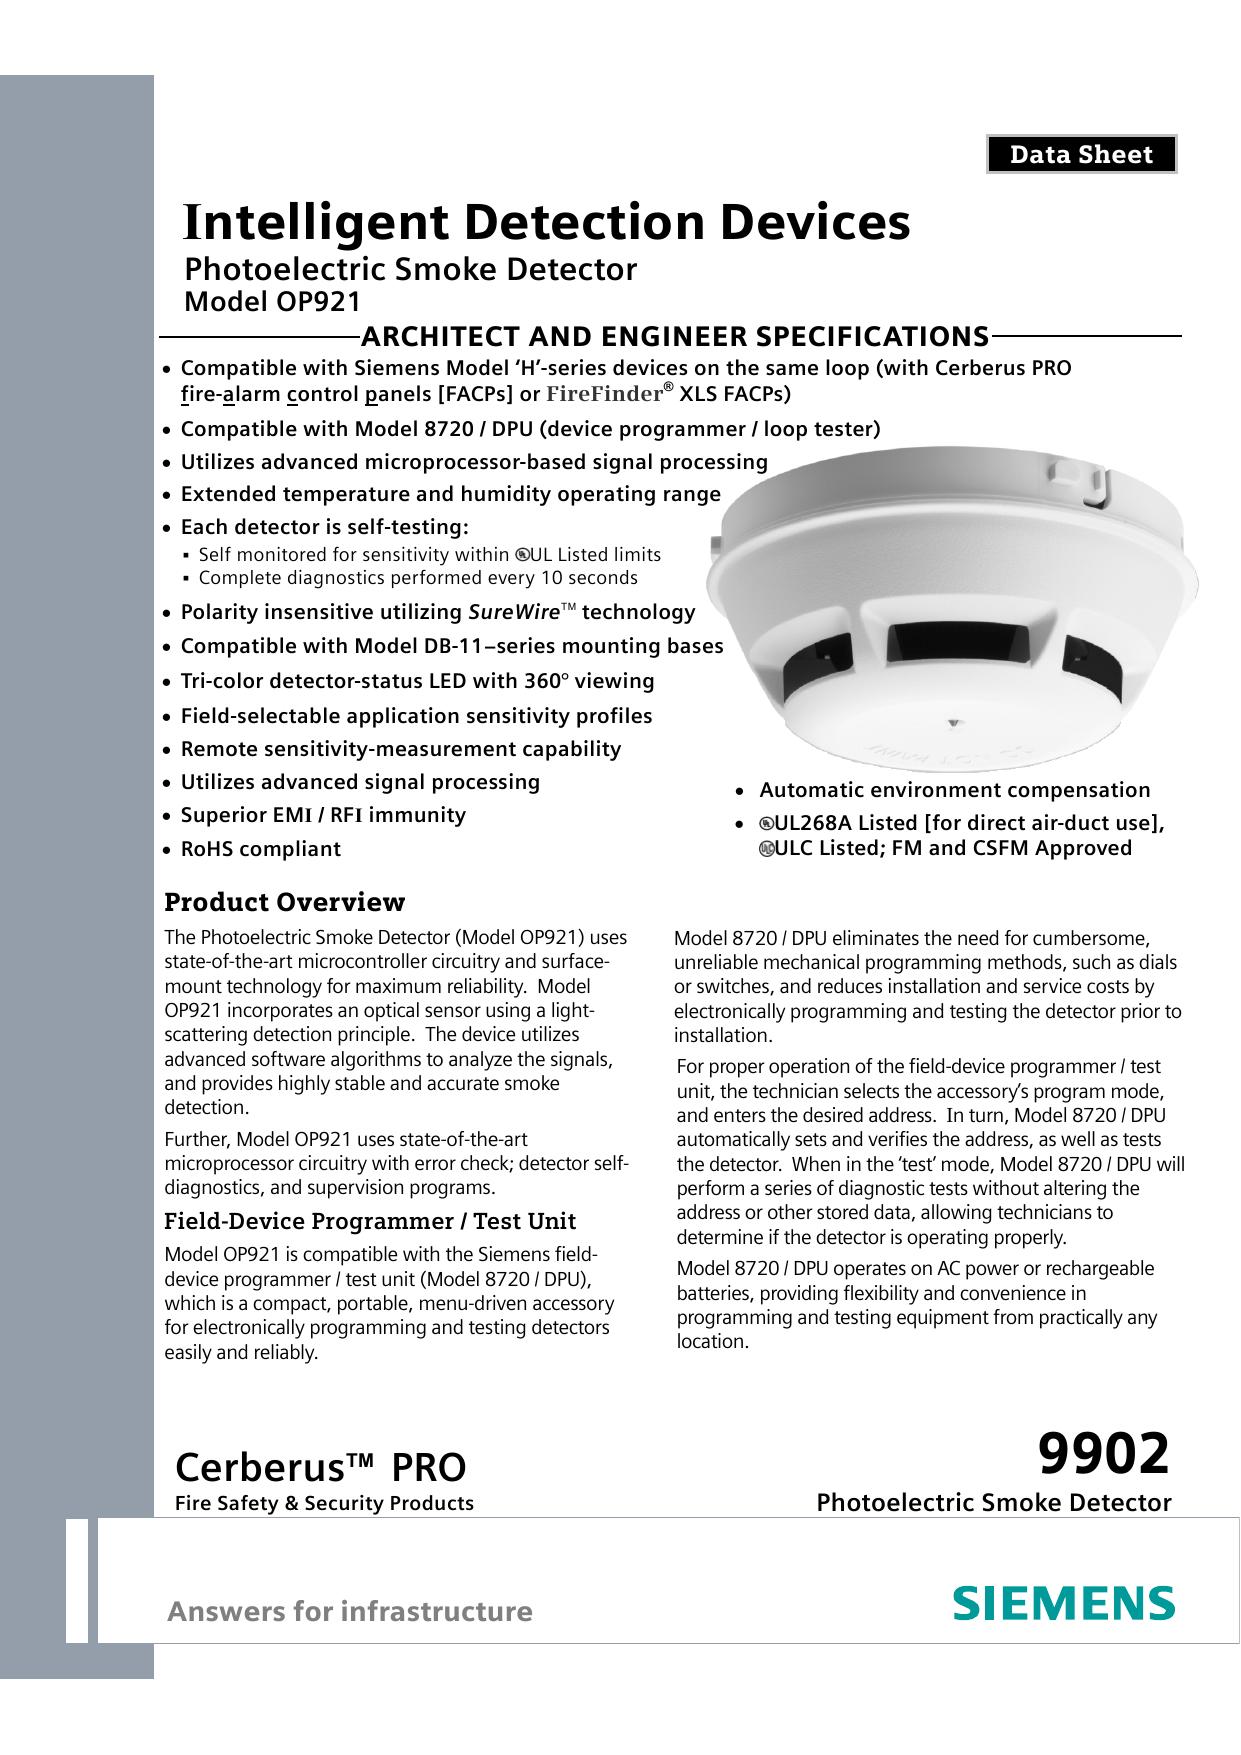 Intelligent Detection Devices | manualzz.com on